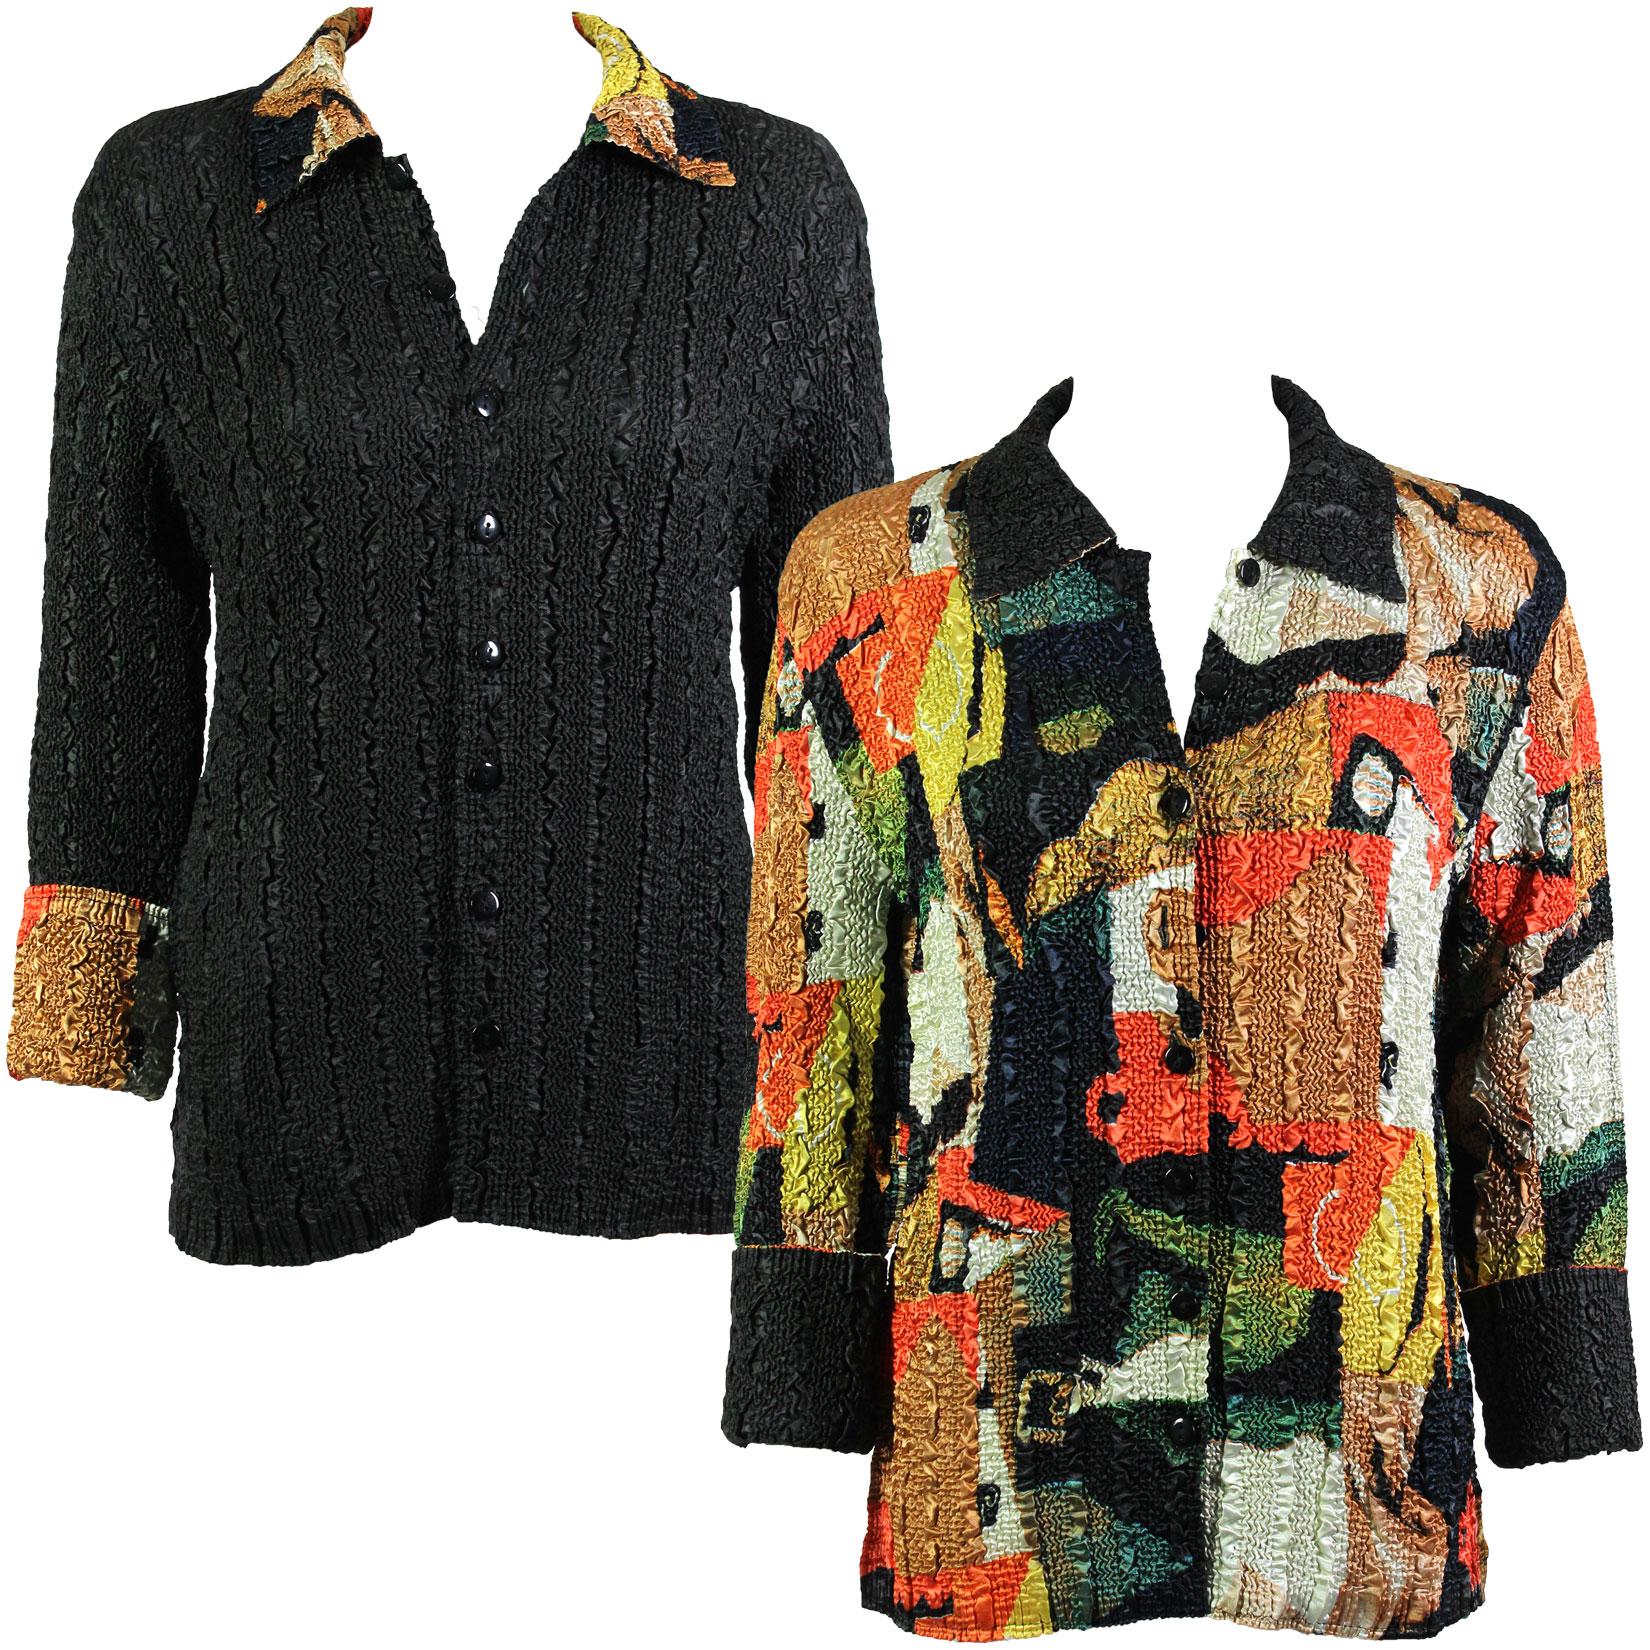 Wholesale Magic Crush - Reversible Jackets #14019 Modern Abstract Print (MB) - S-M